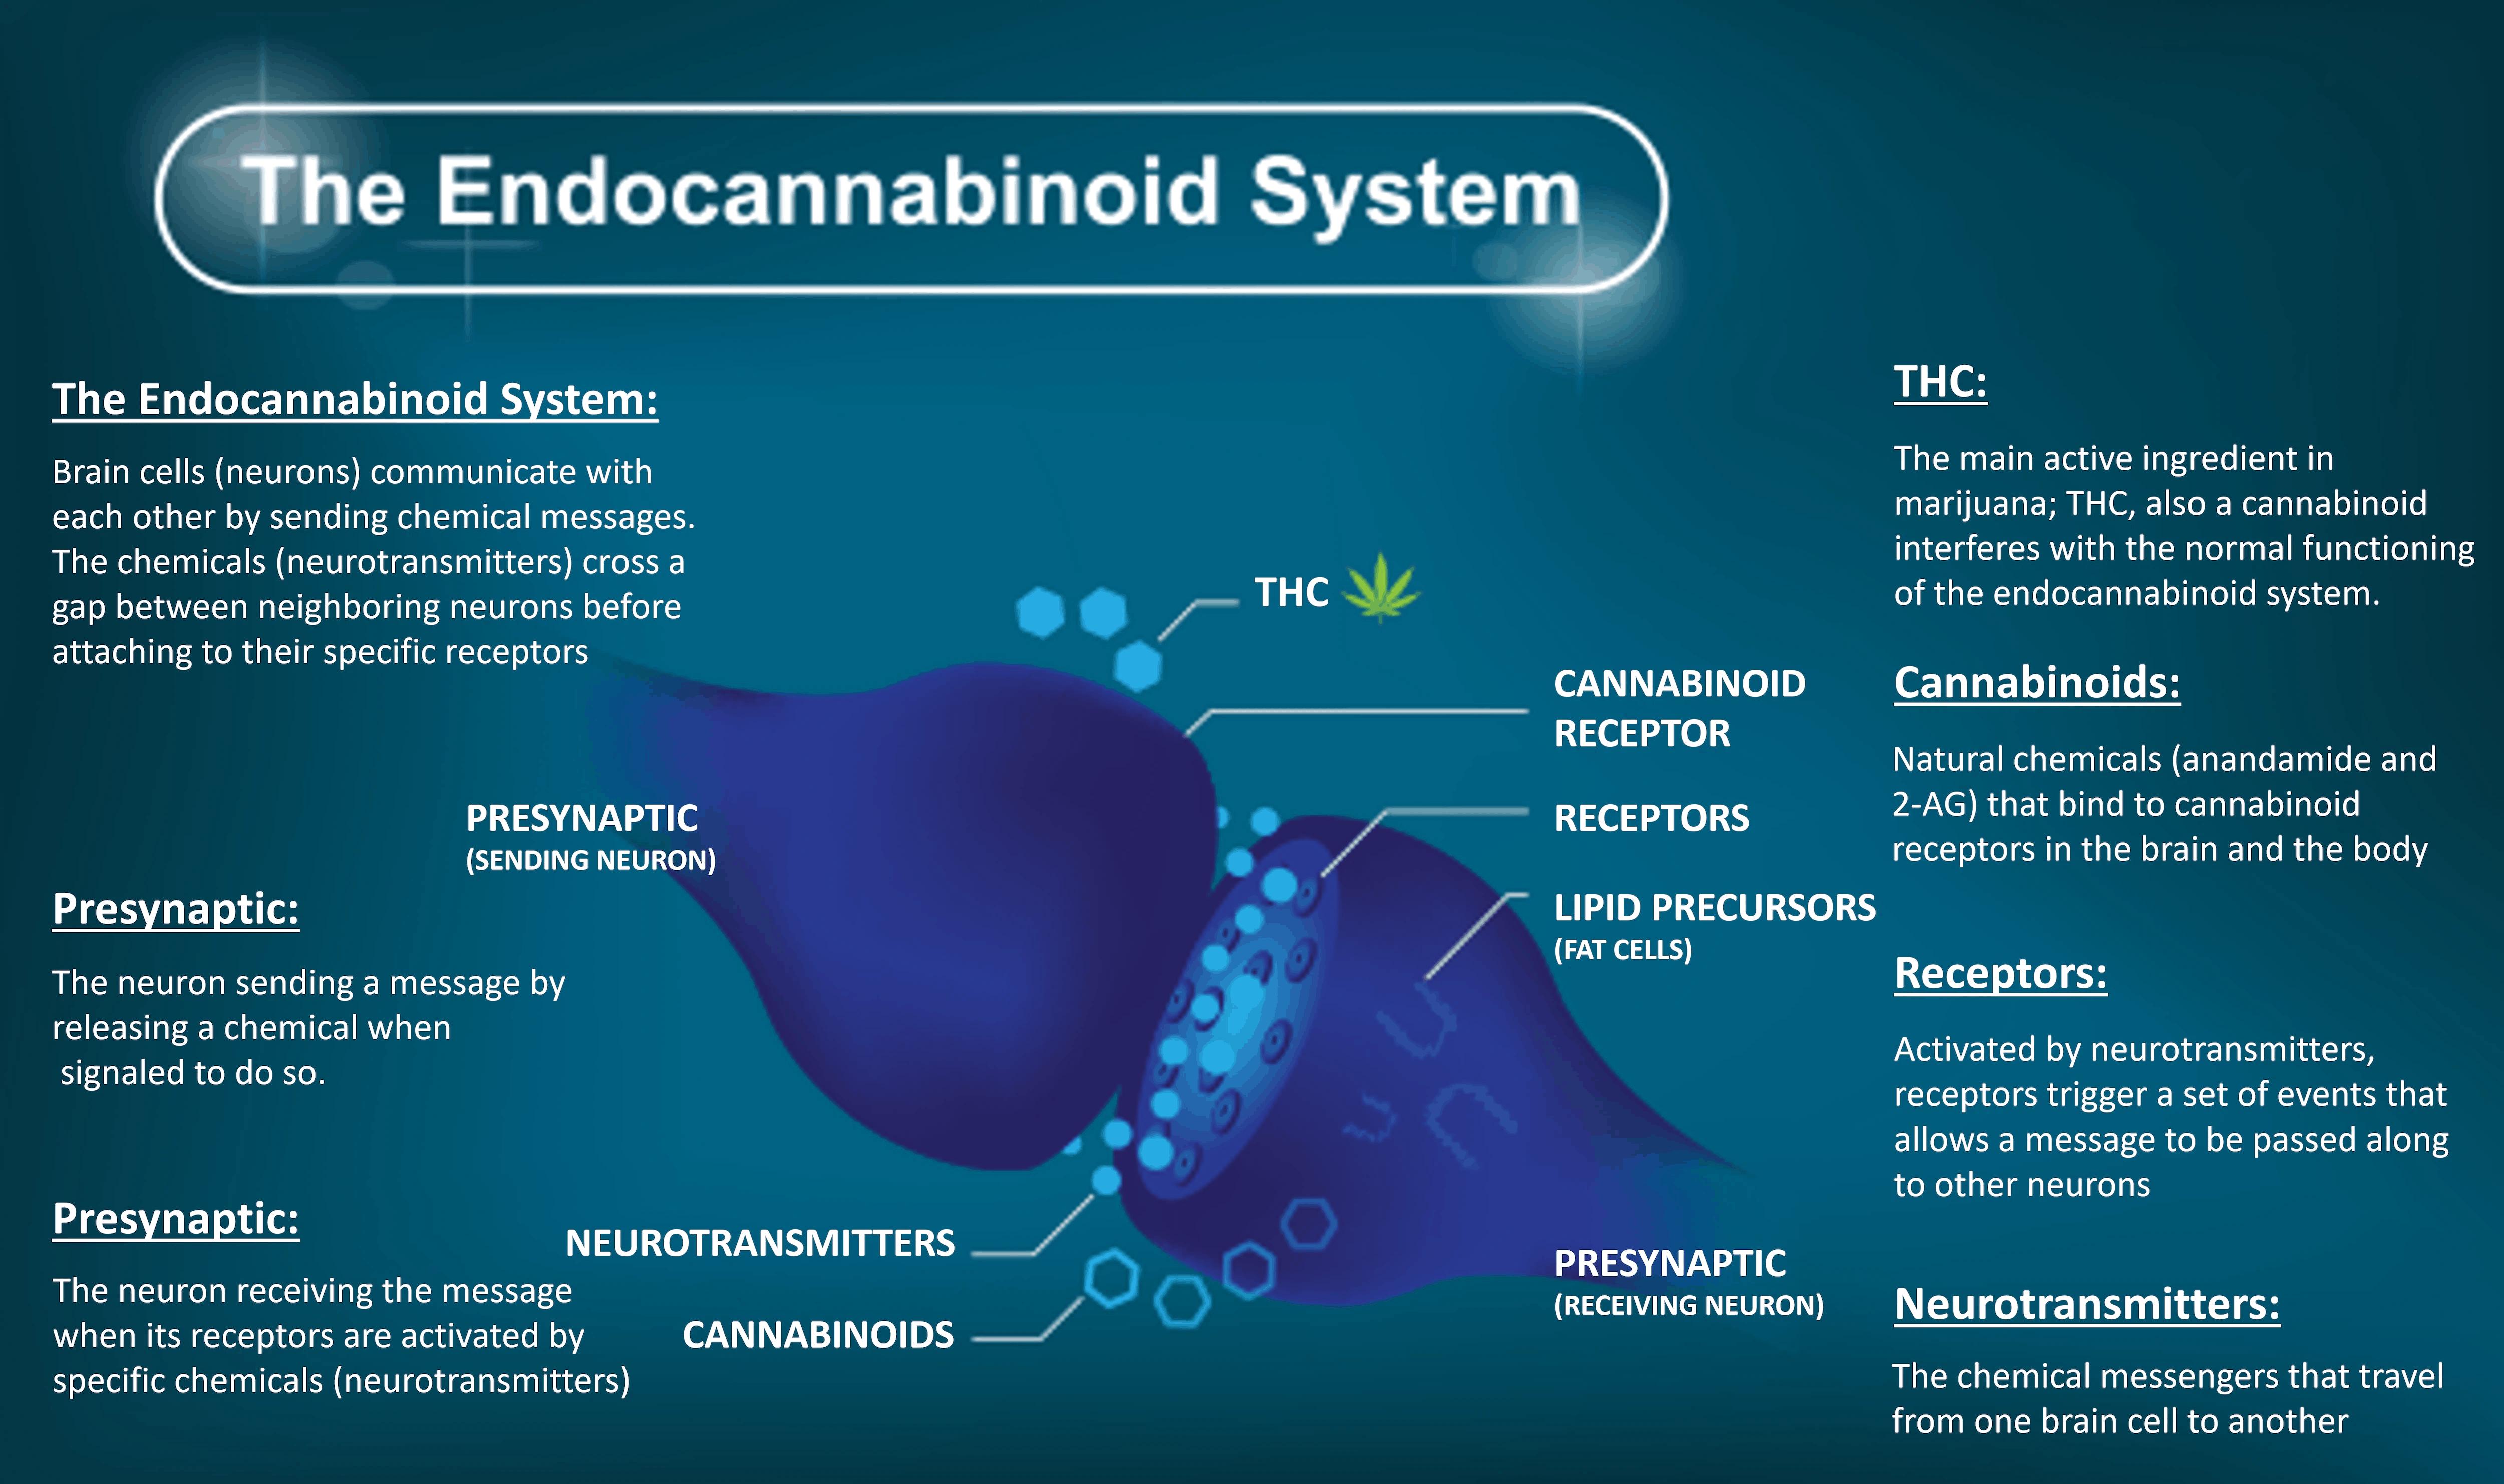 CBDLavita Coupon Code Endocannabinoid System